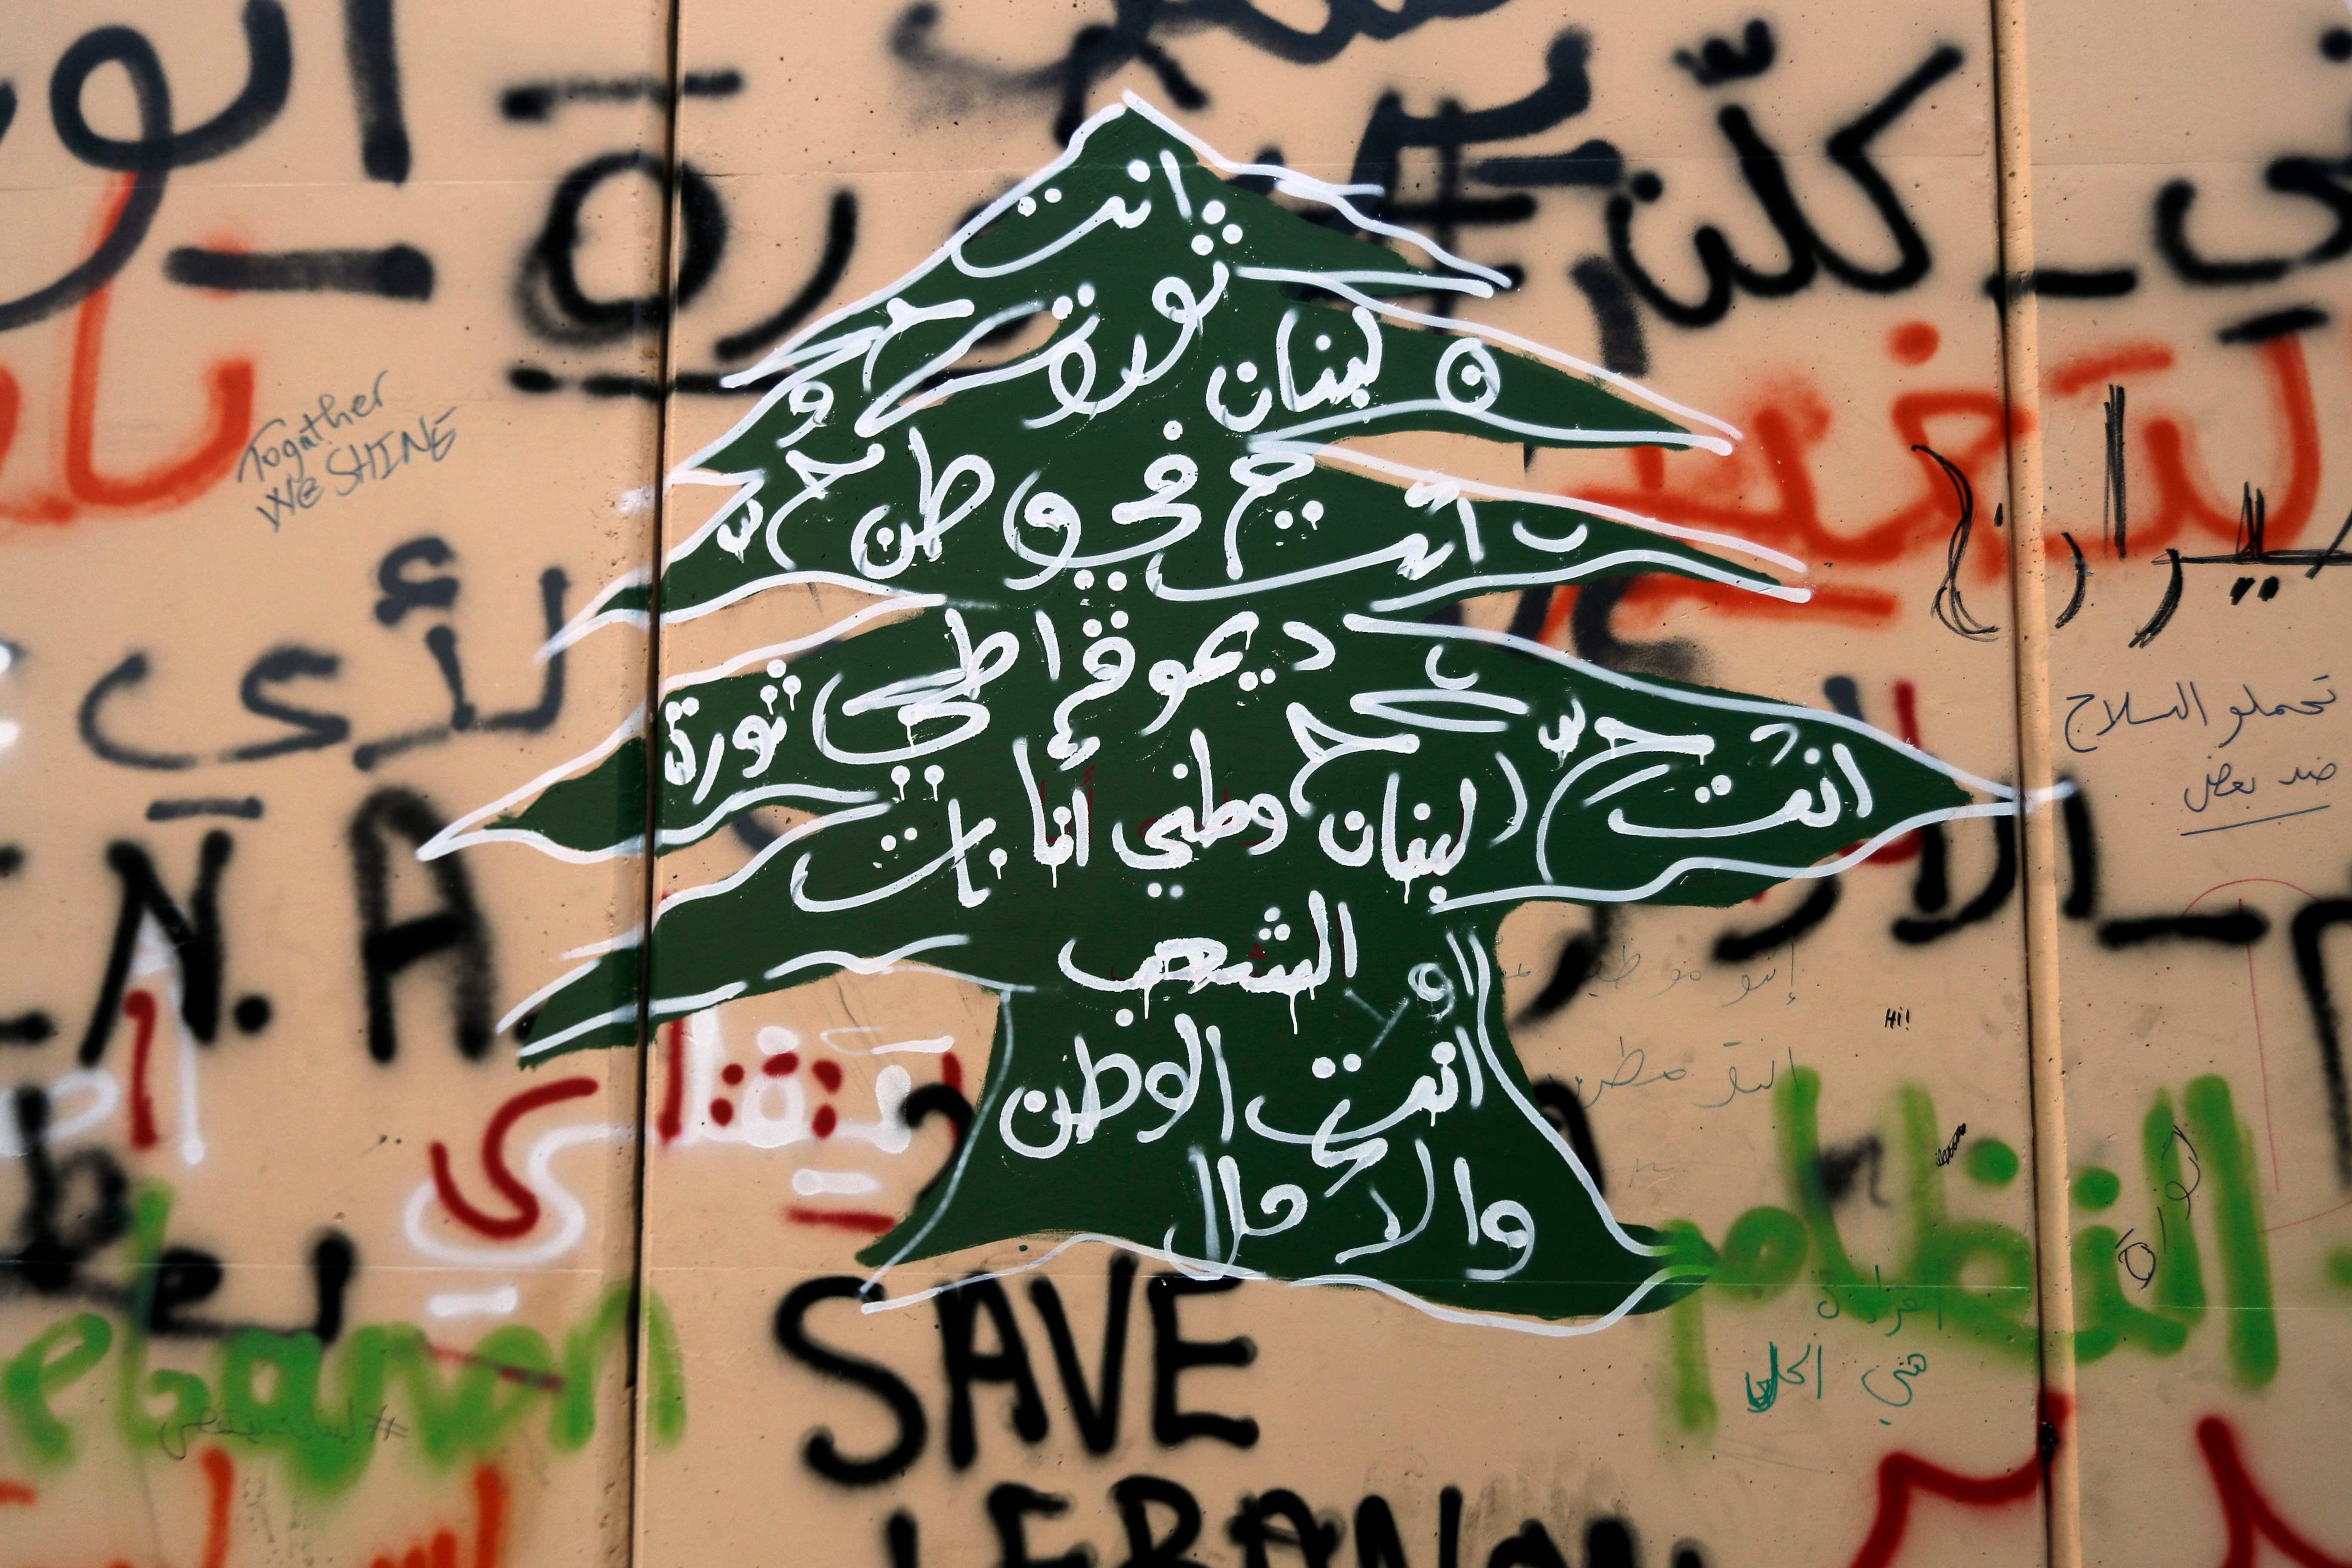 LEBANON-POLITICS-DEMO-ART